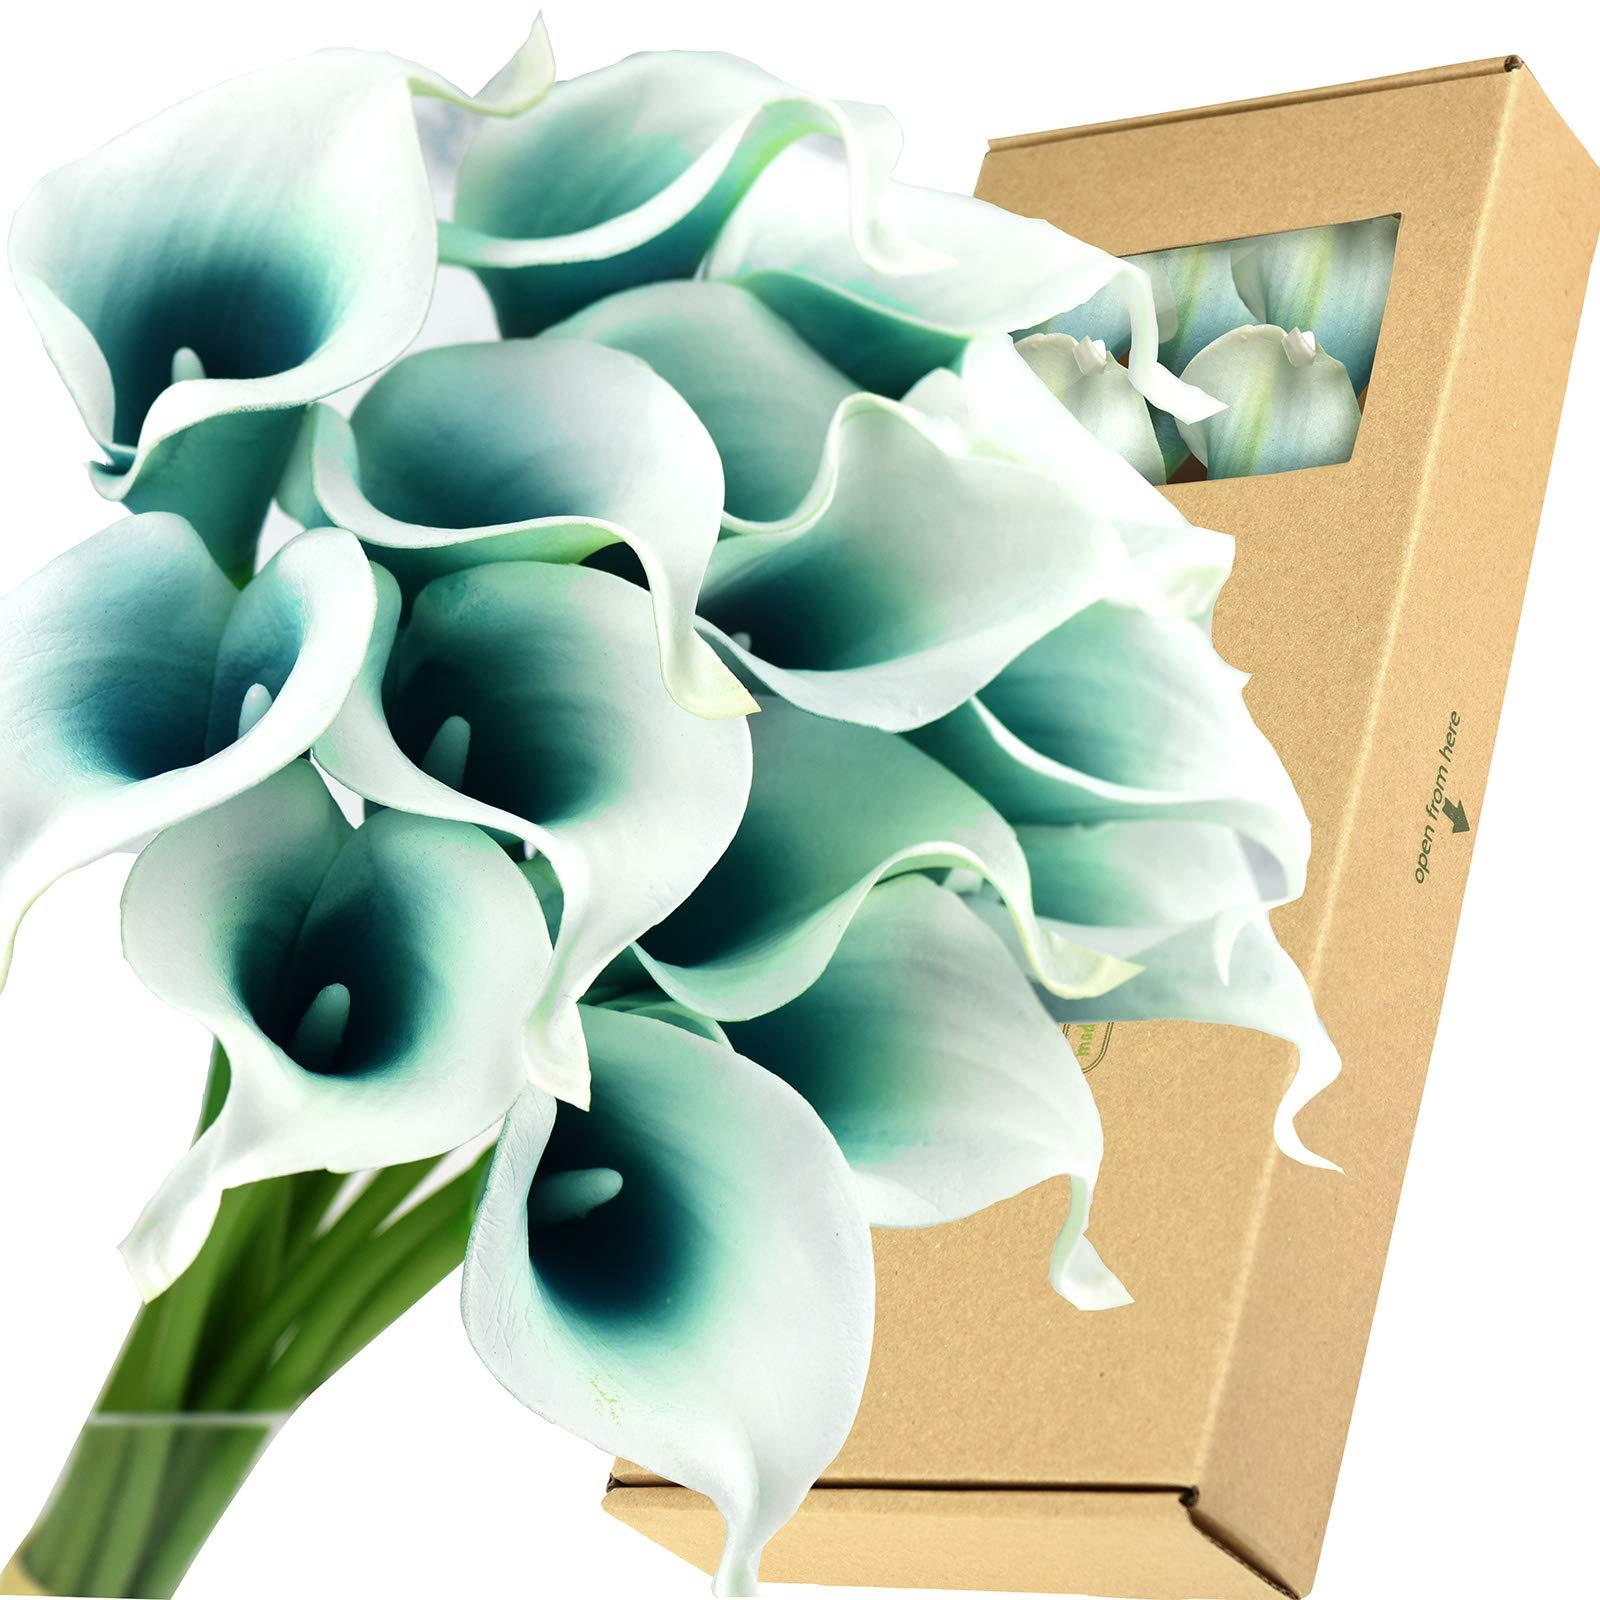 FiveSeasonStuff Real Touch Calla Lilies Artificial Flowers Wedding Bridal Bouquet Home Décor Party |Floral Arrangments | 15 Stems (Silk White & Carribean Green) by FiveSeasonStuff